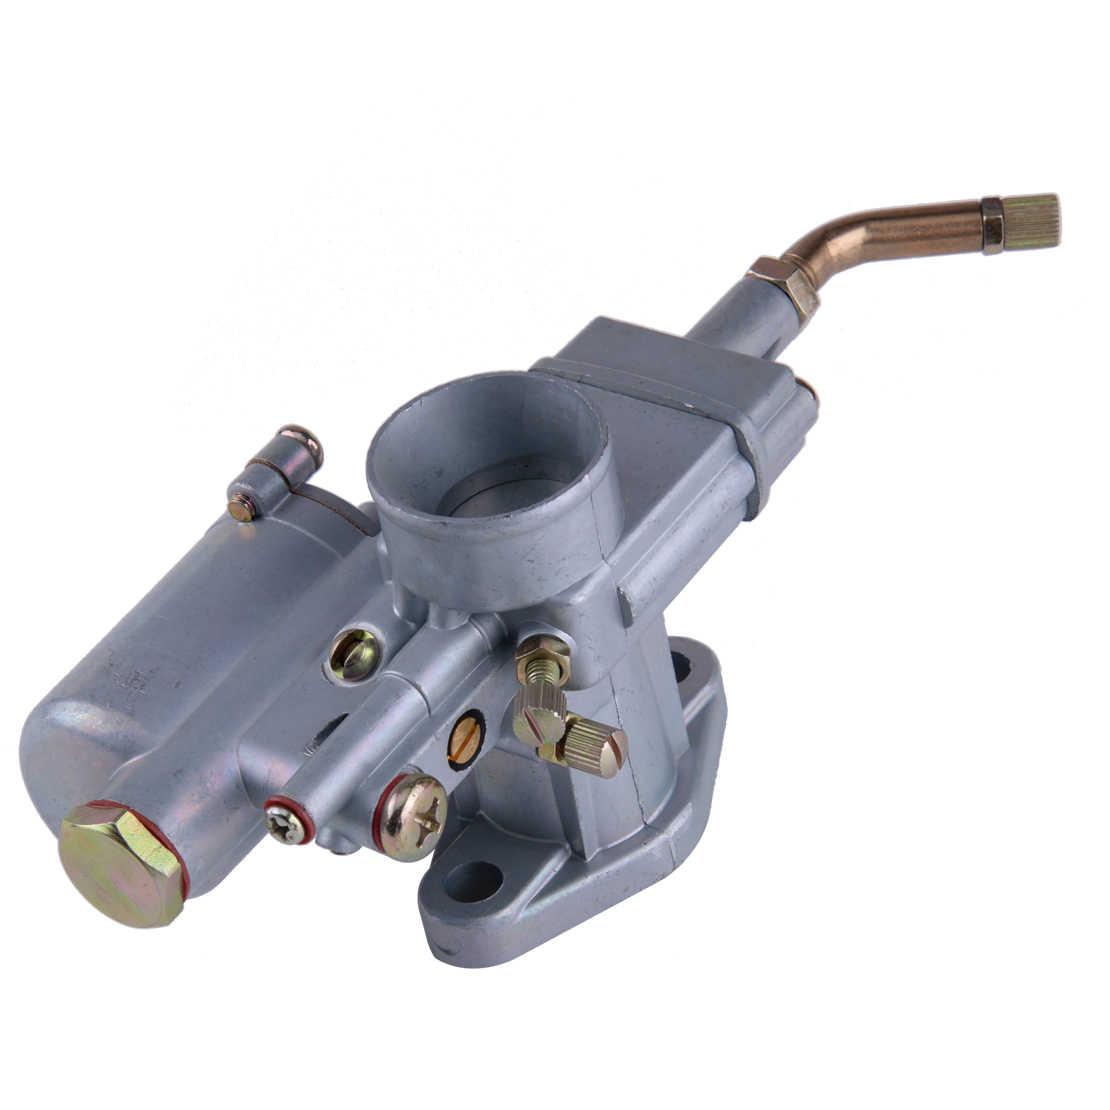 DWCX 1 пара 28 мм Carb пара Vergaser карбюратор Carby подходит для K302 BMW M72 MT Урал K750 МВт Днепр